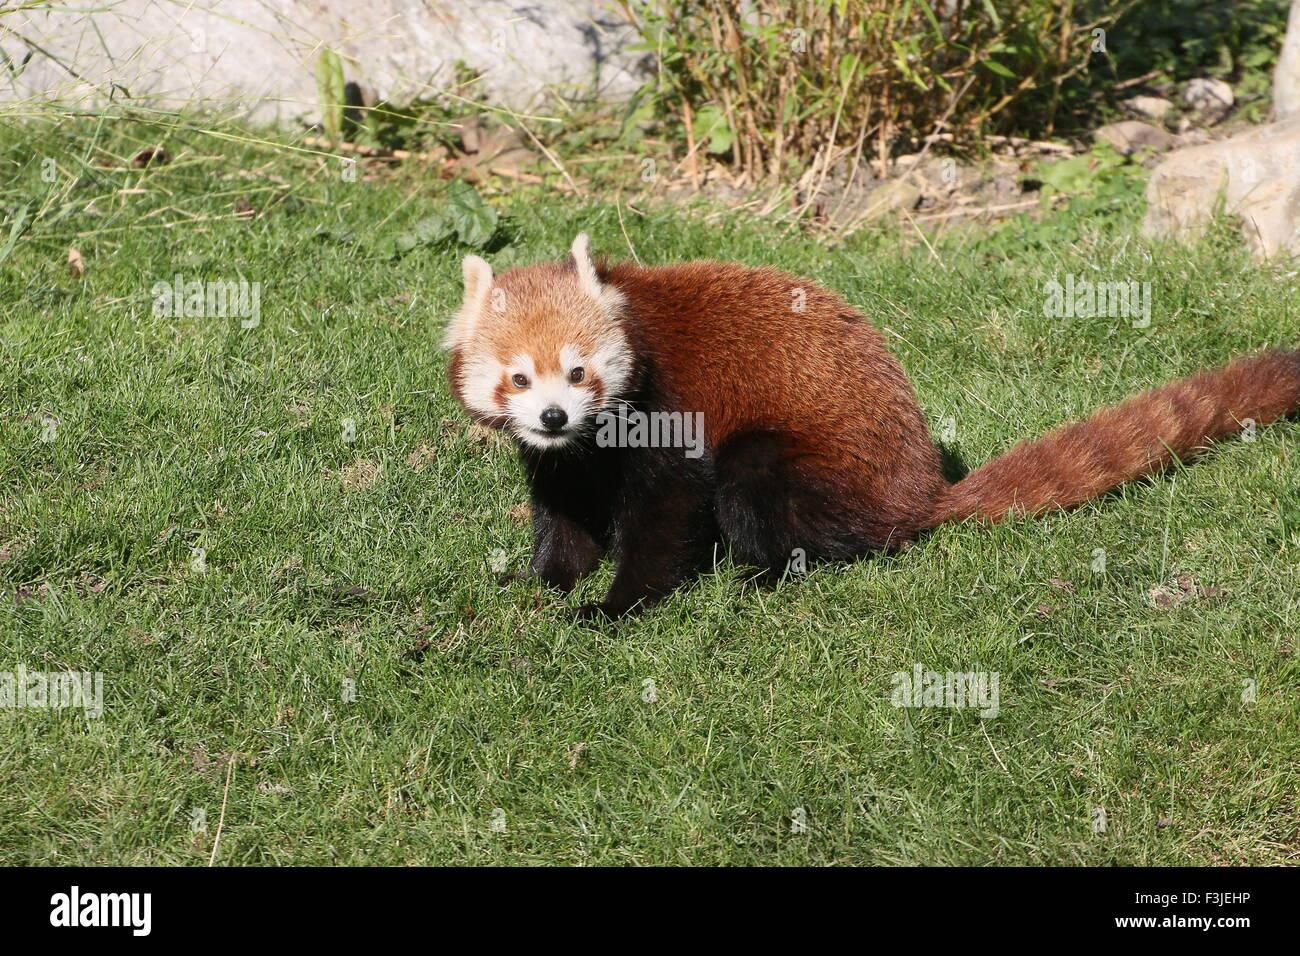 Panda rouge asiatique (Ailurus fulgens) Photo Stock